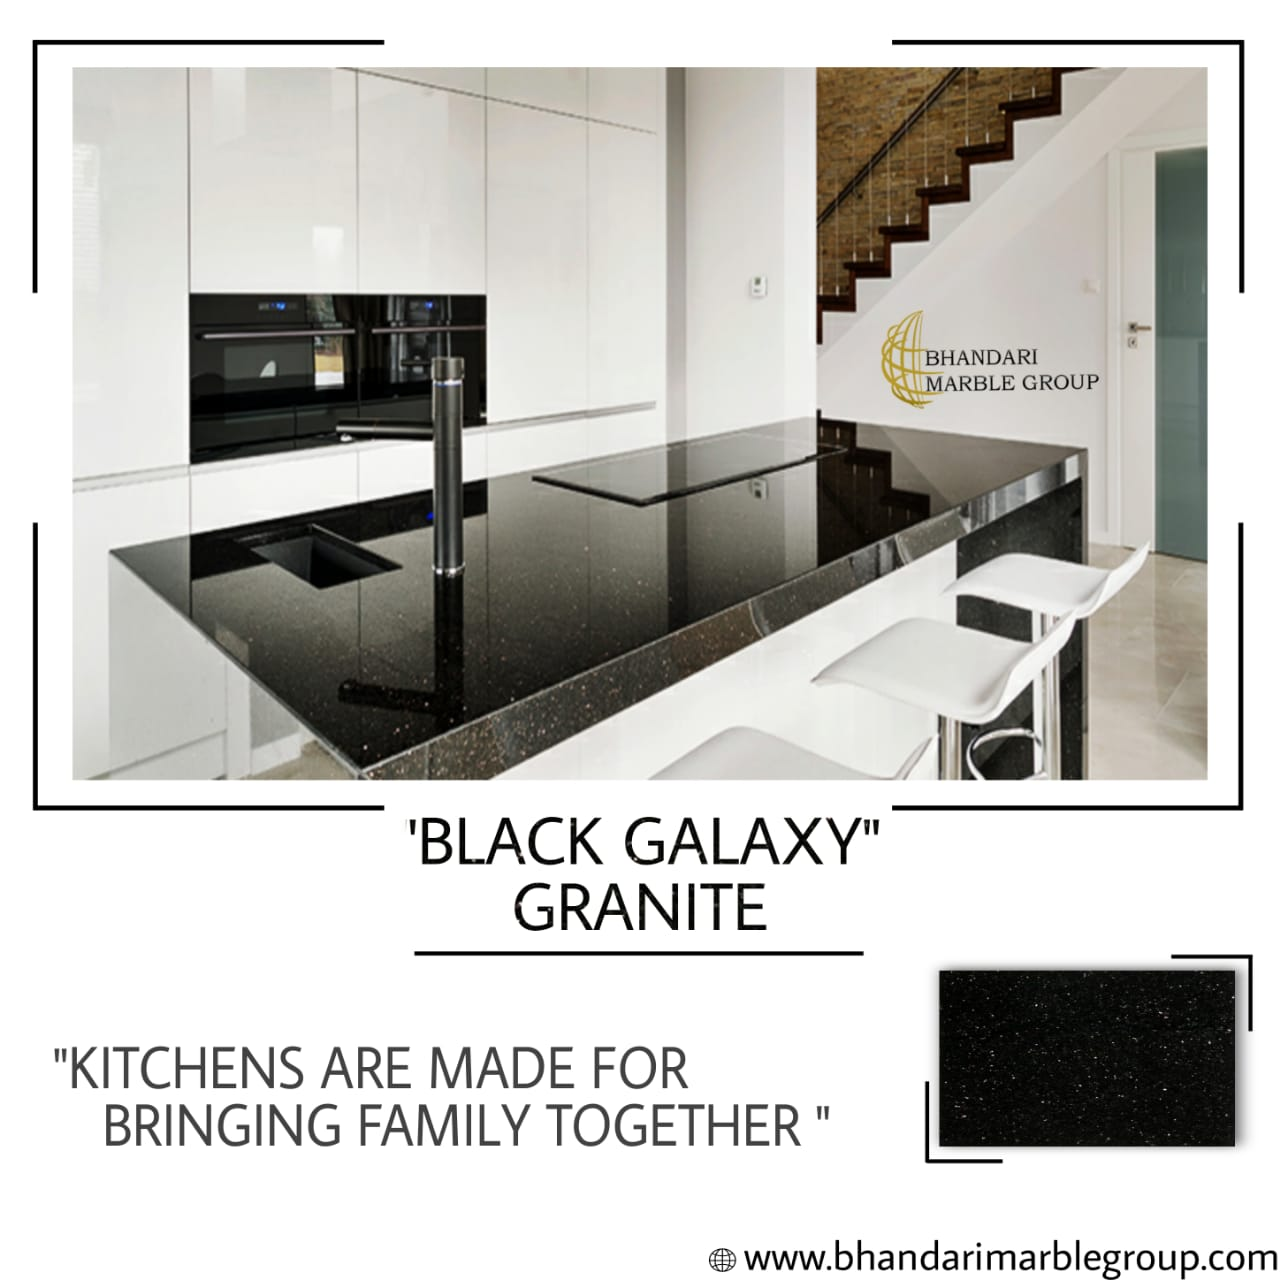 Black Galaxy Granite in India